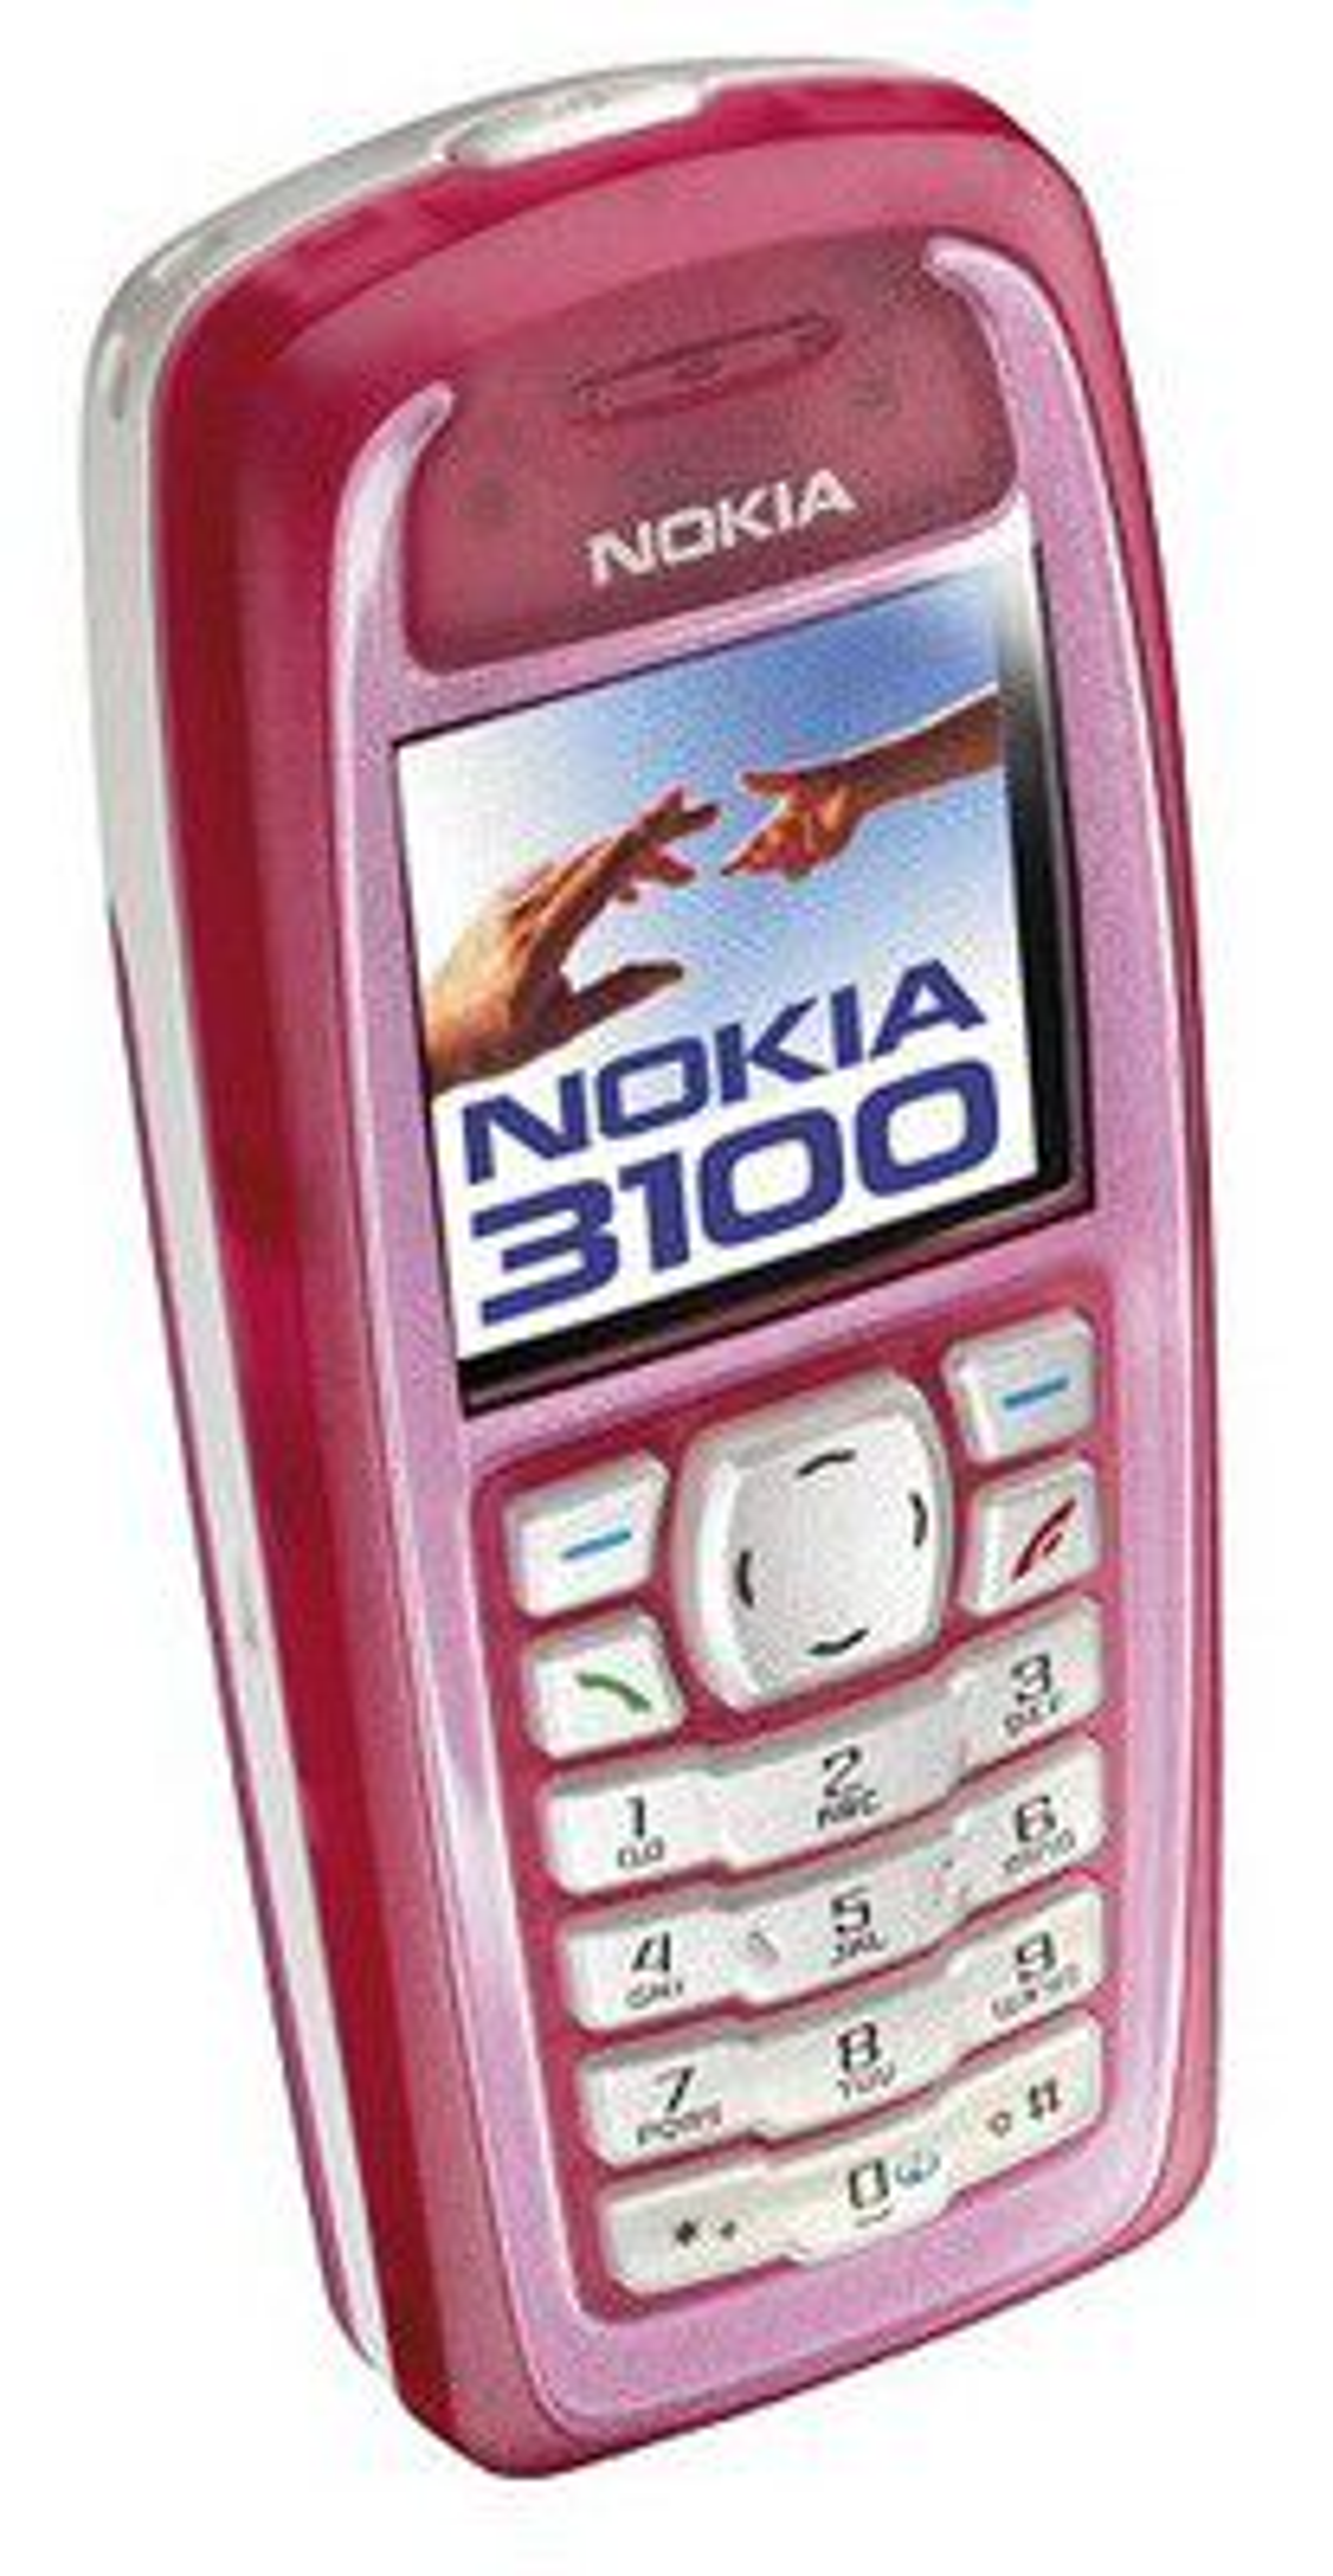 edb538010ee Iphone 5s 16gb på tilbud den perfekte gave til min kone